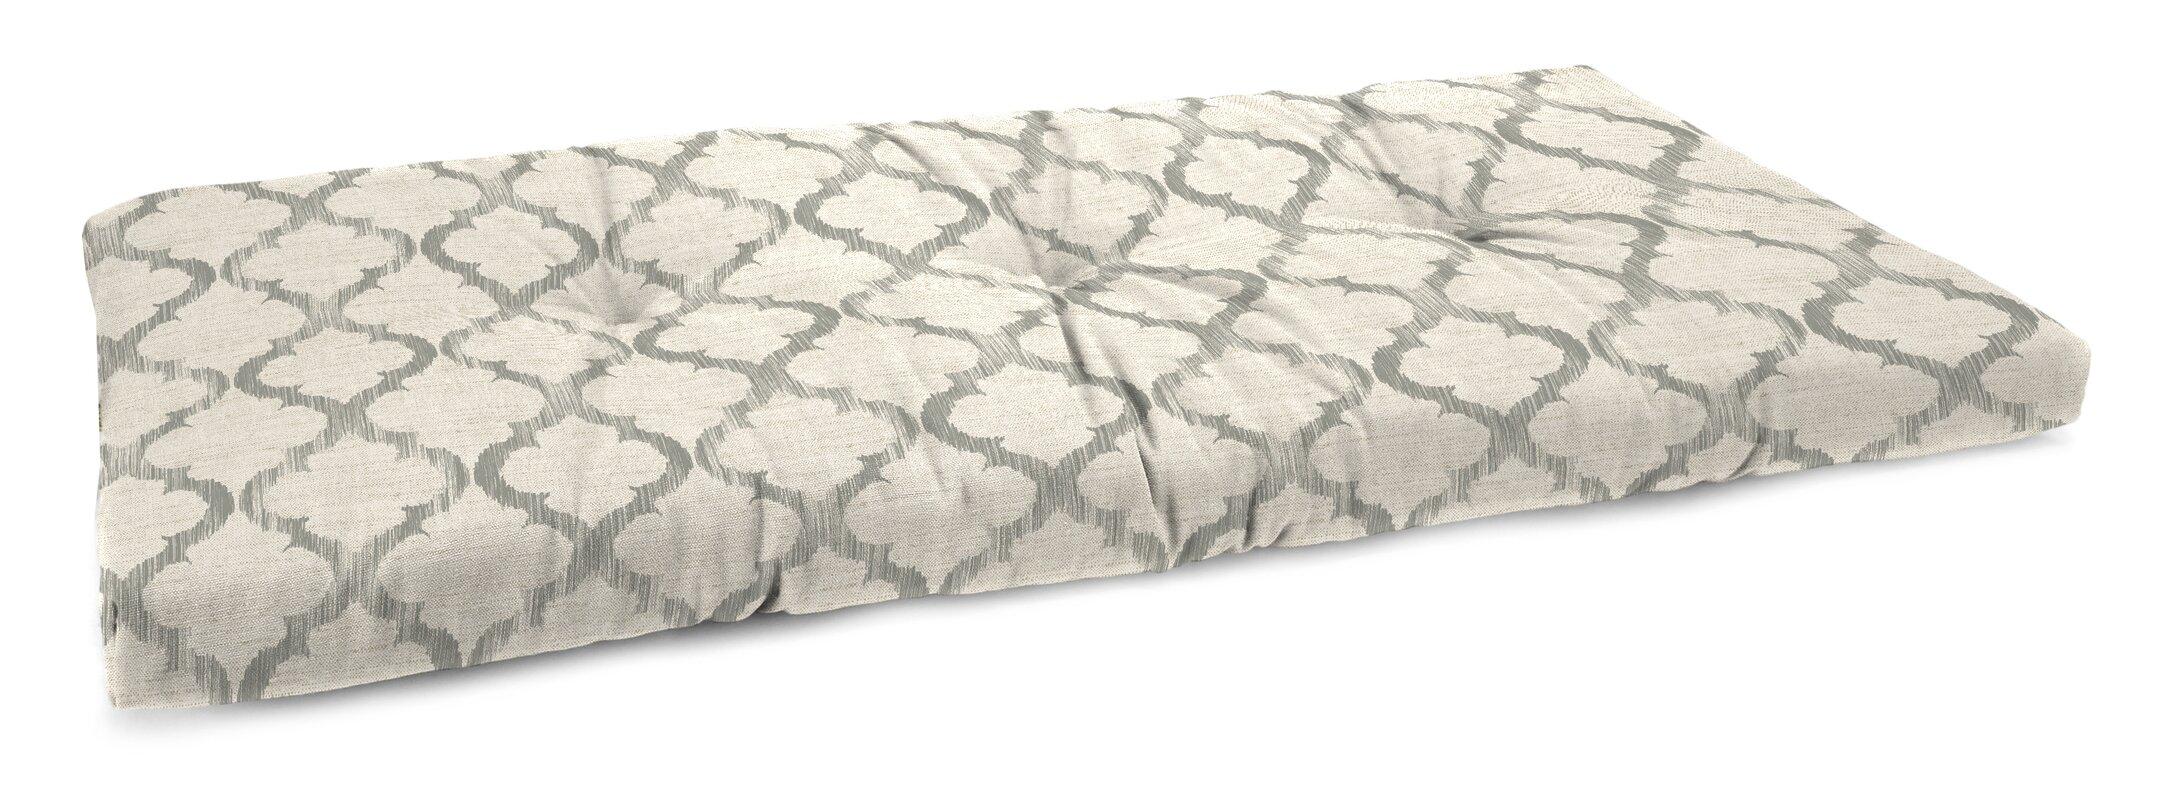 Laurel Foundry Modern Farmhouse Tufted Linen Indoor Bench Cushion Reviews Wayfair